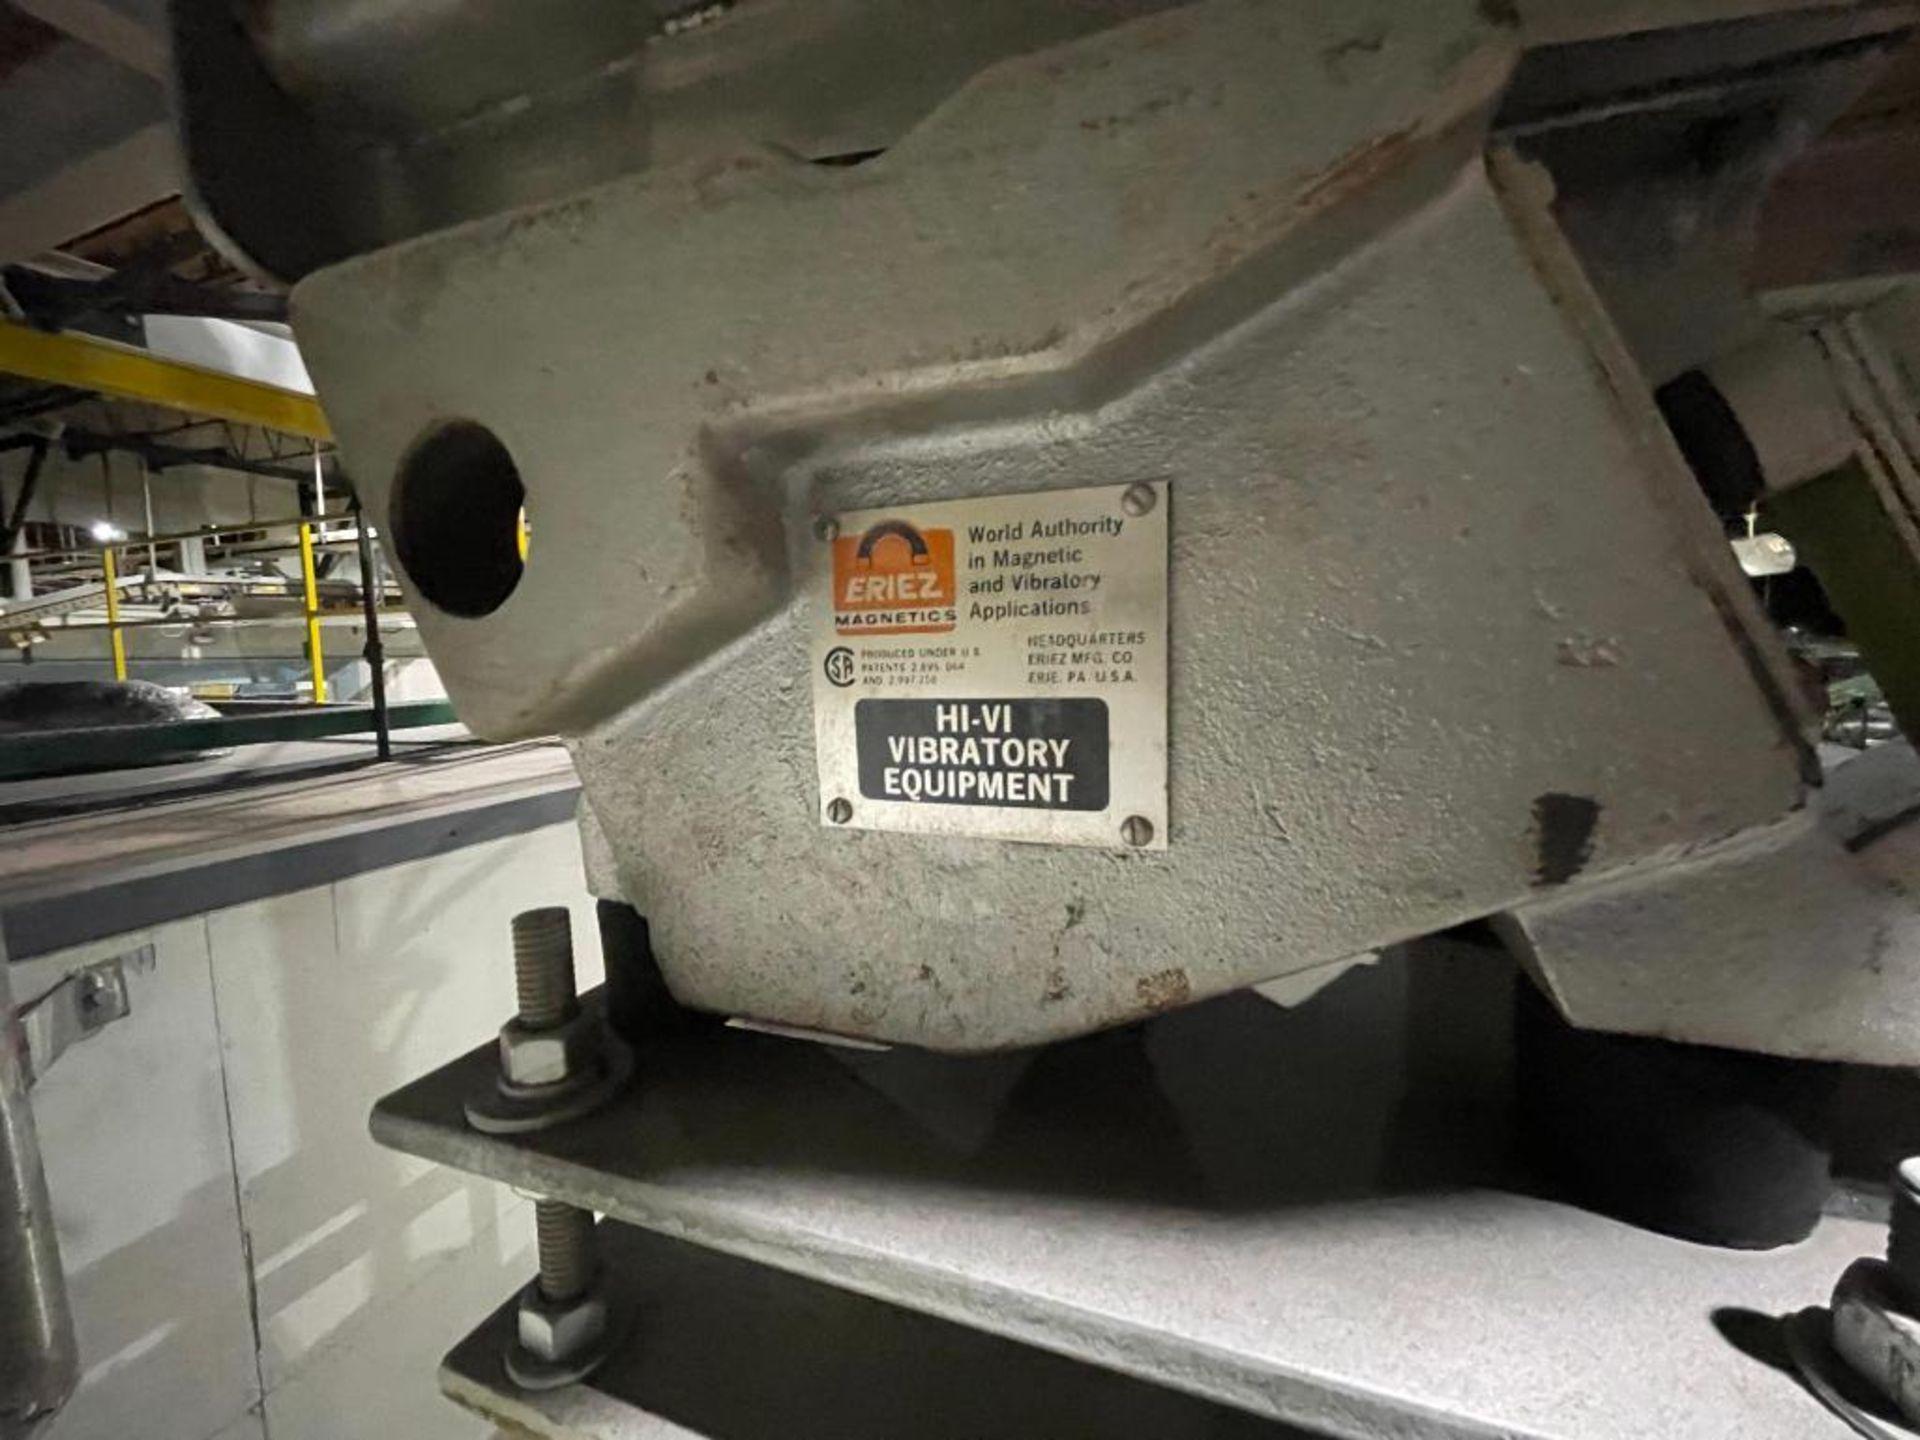 Eriez vibratory conveyor - Image 3 of 12